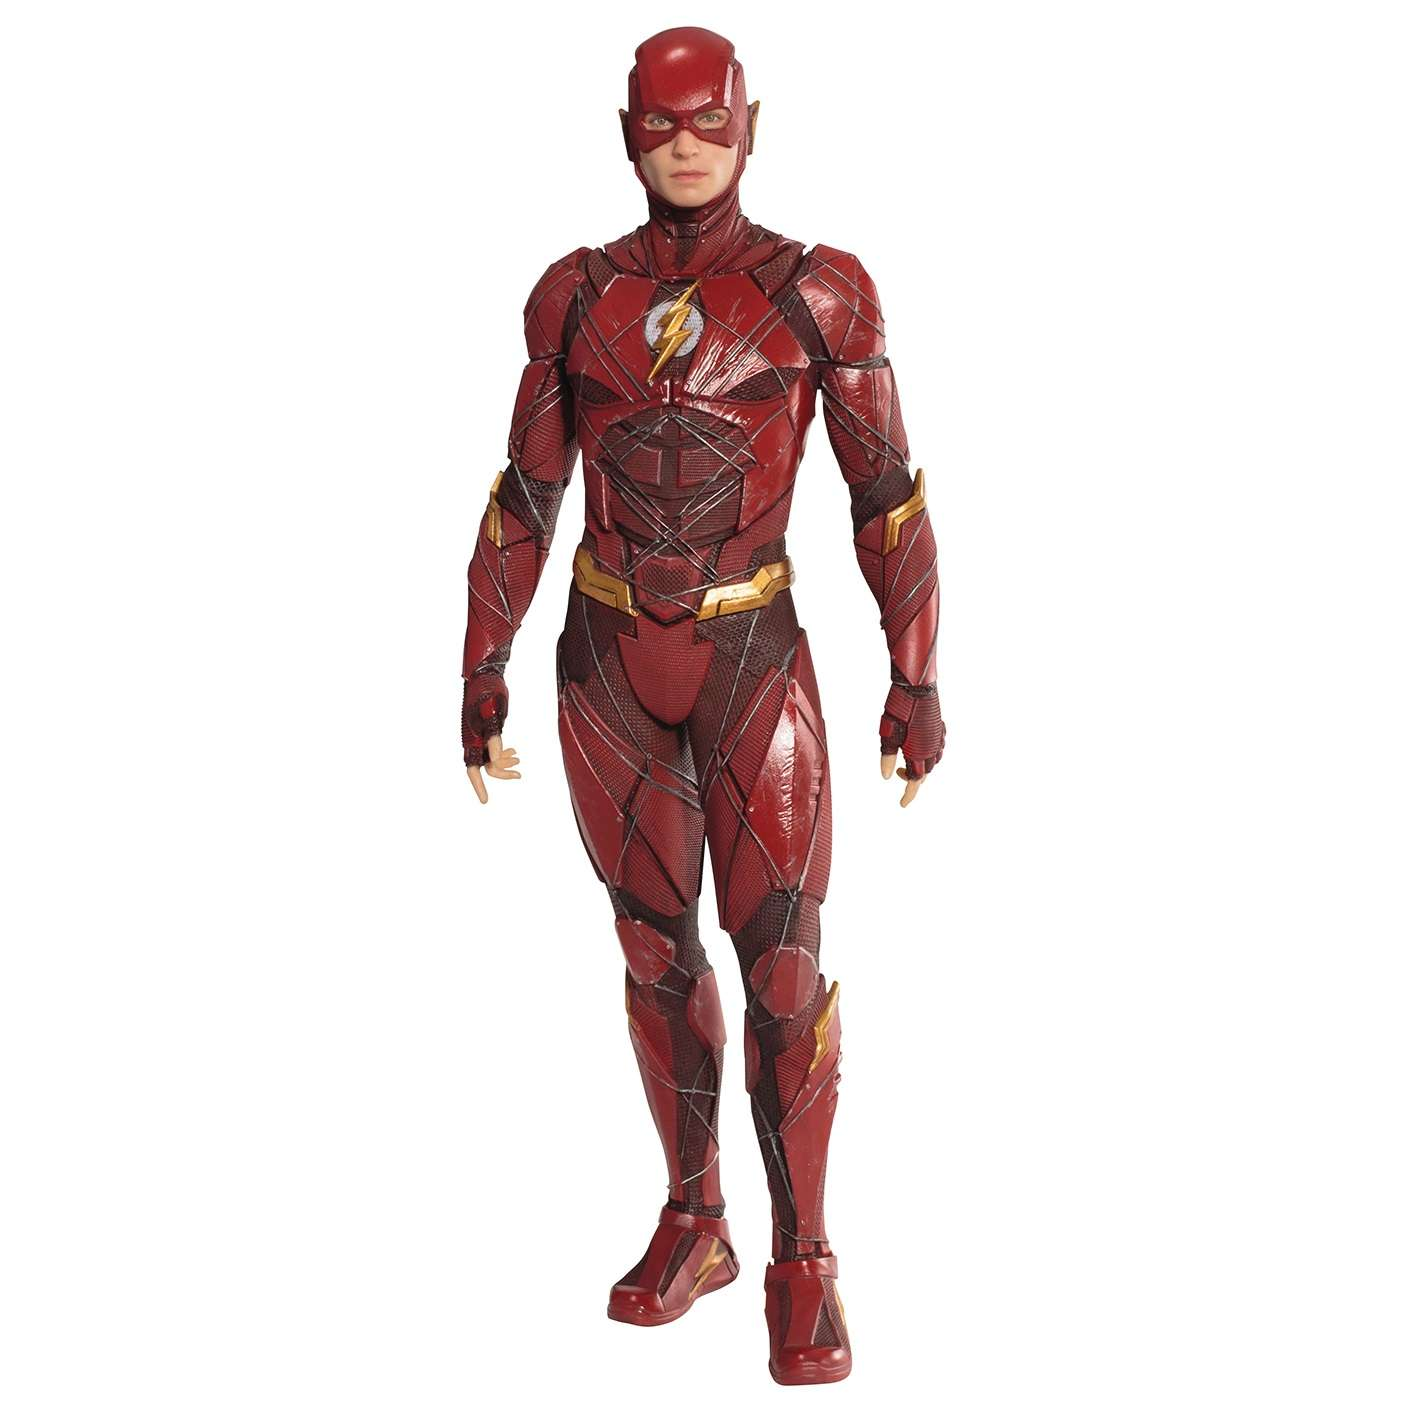 ArtFX+ Statue: Justice League - The Flash Photo